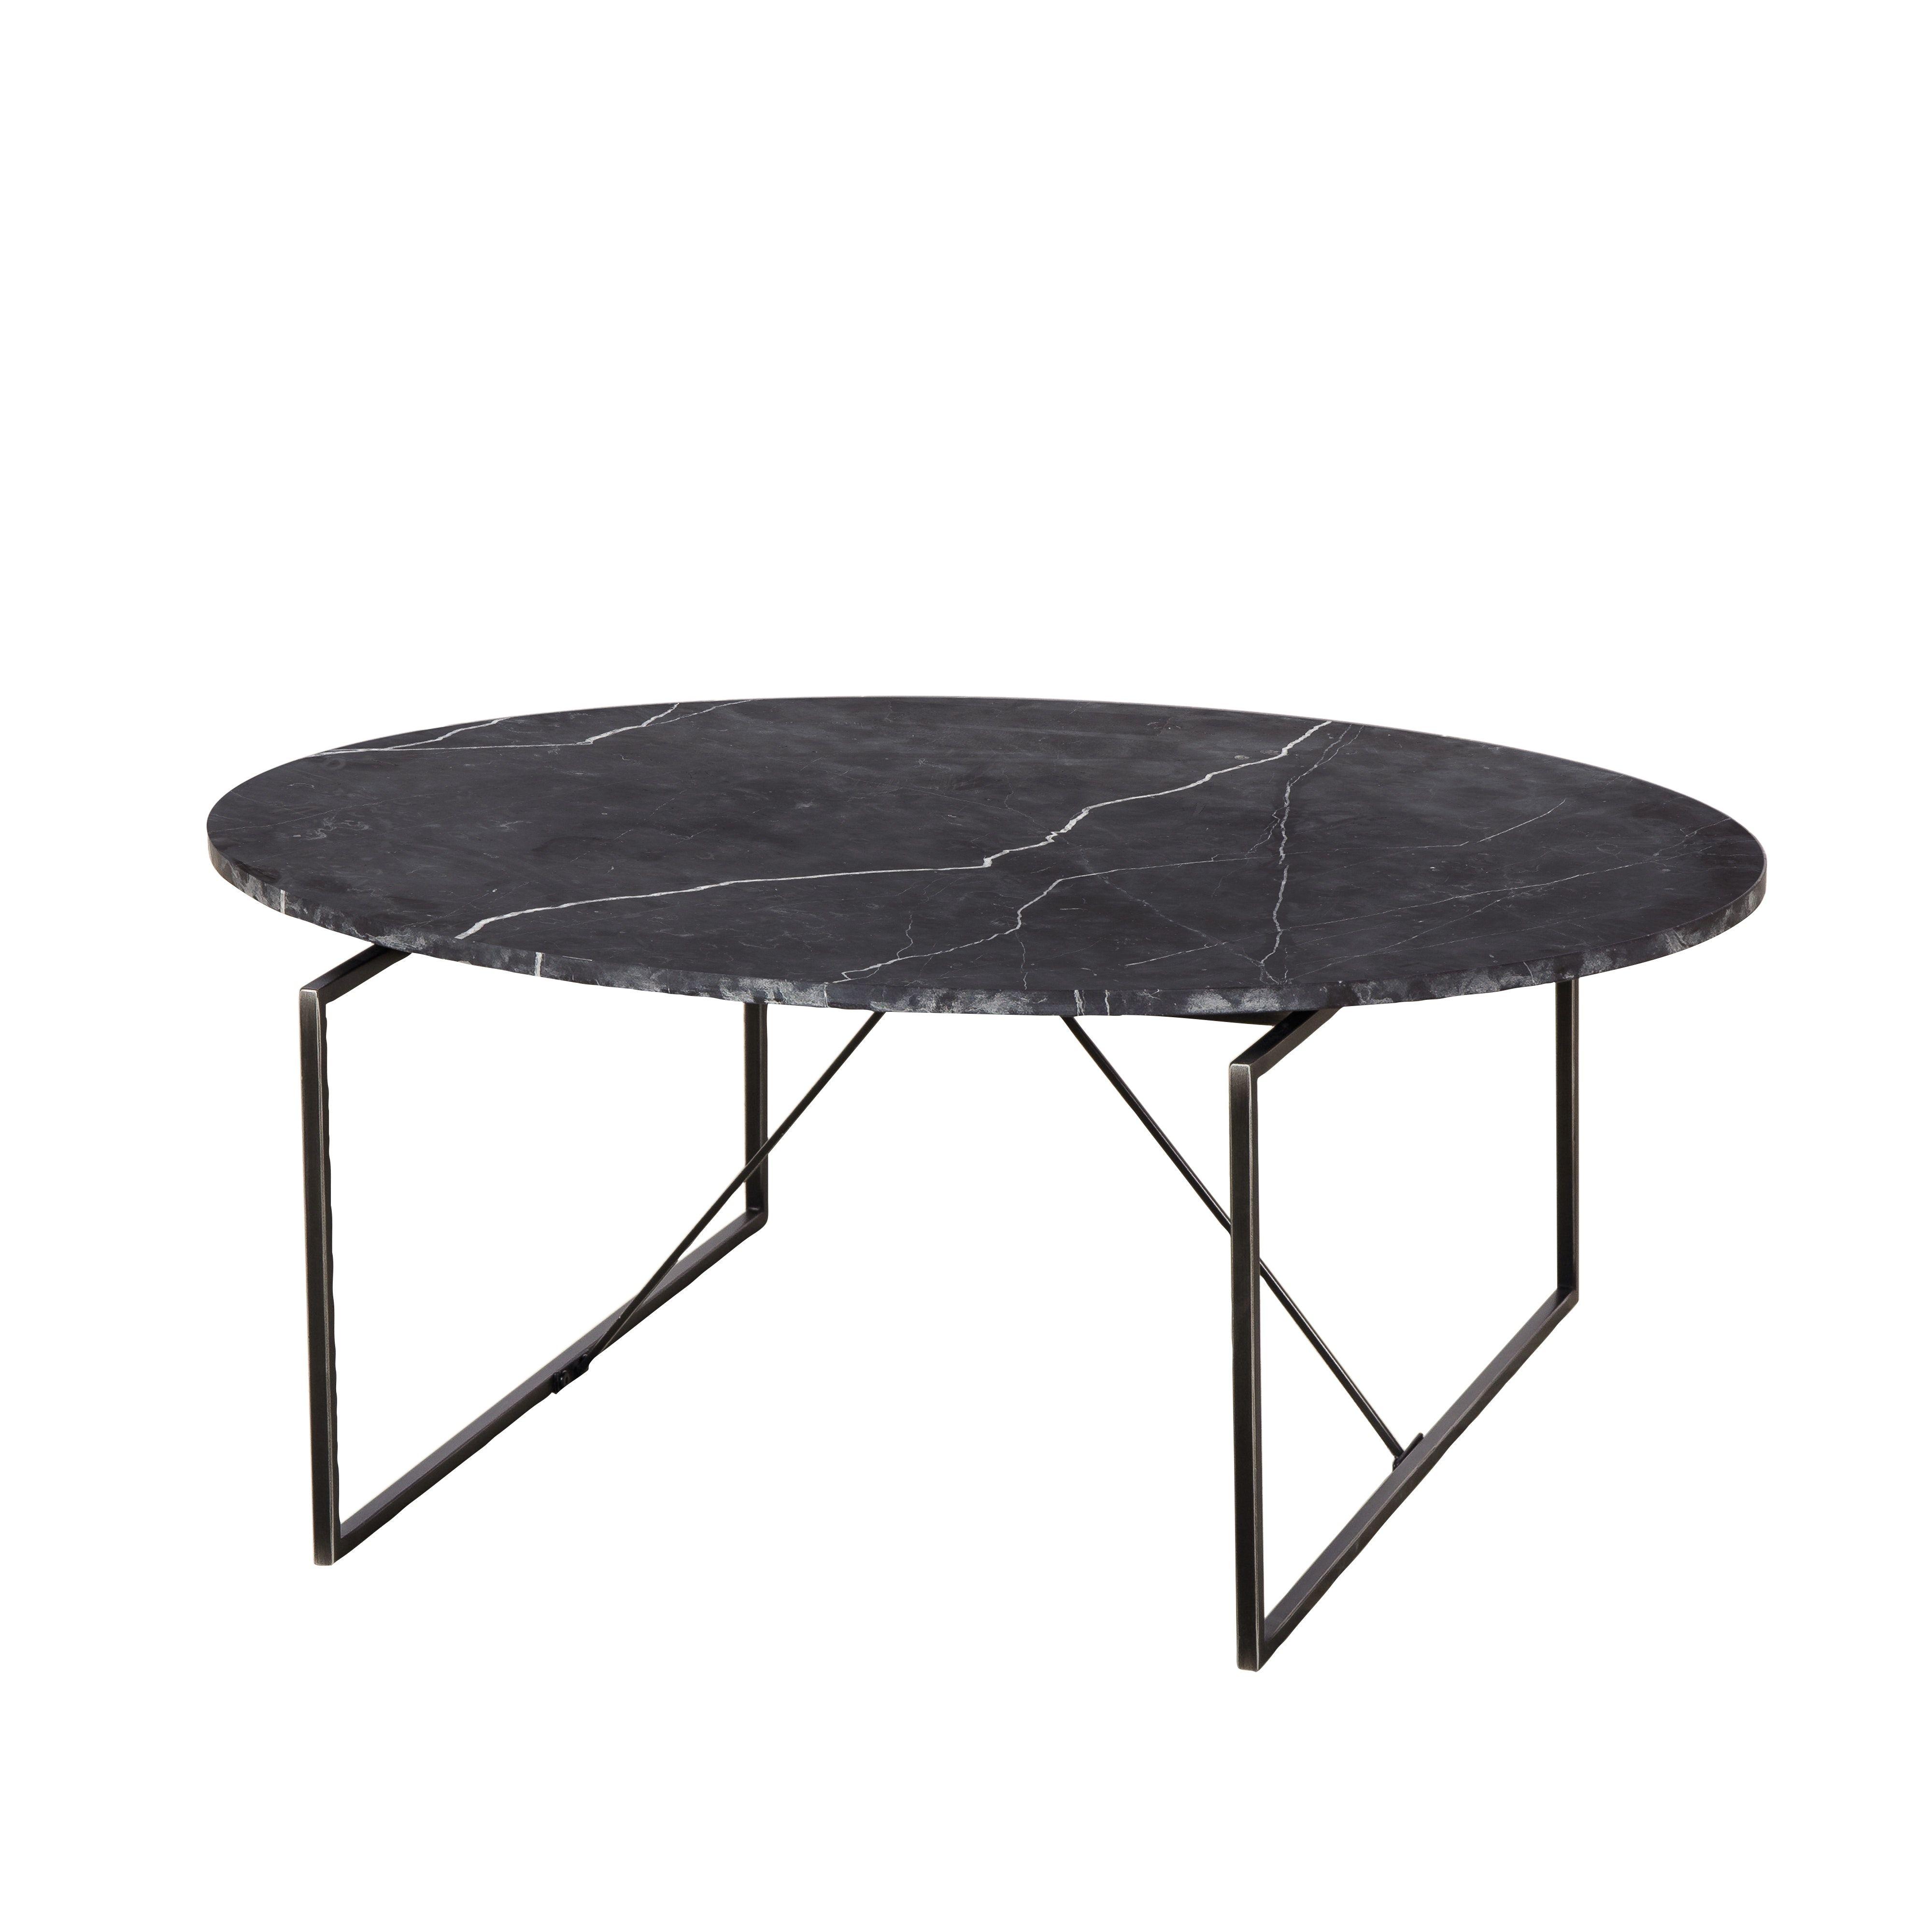 Georgina Coffee Table Black Marble By Sonder Living Coffee Table Marble Tables Design Sconce Decor